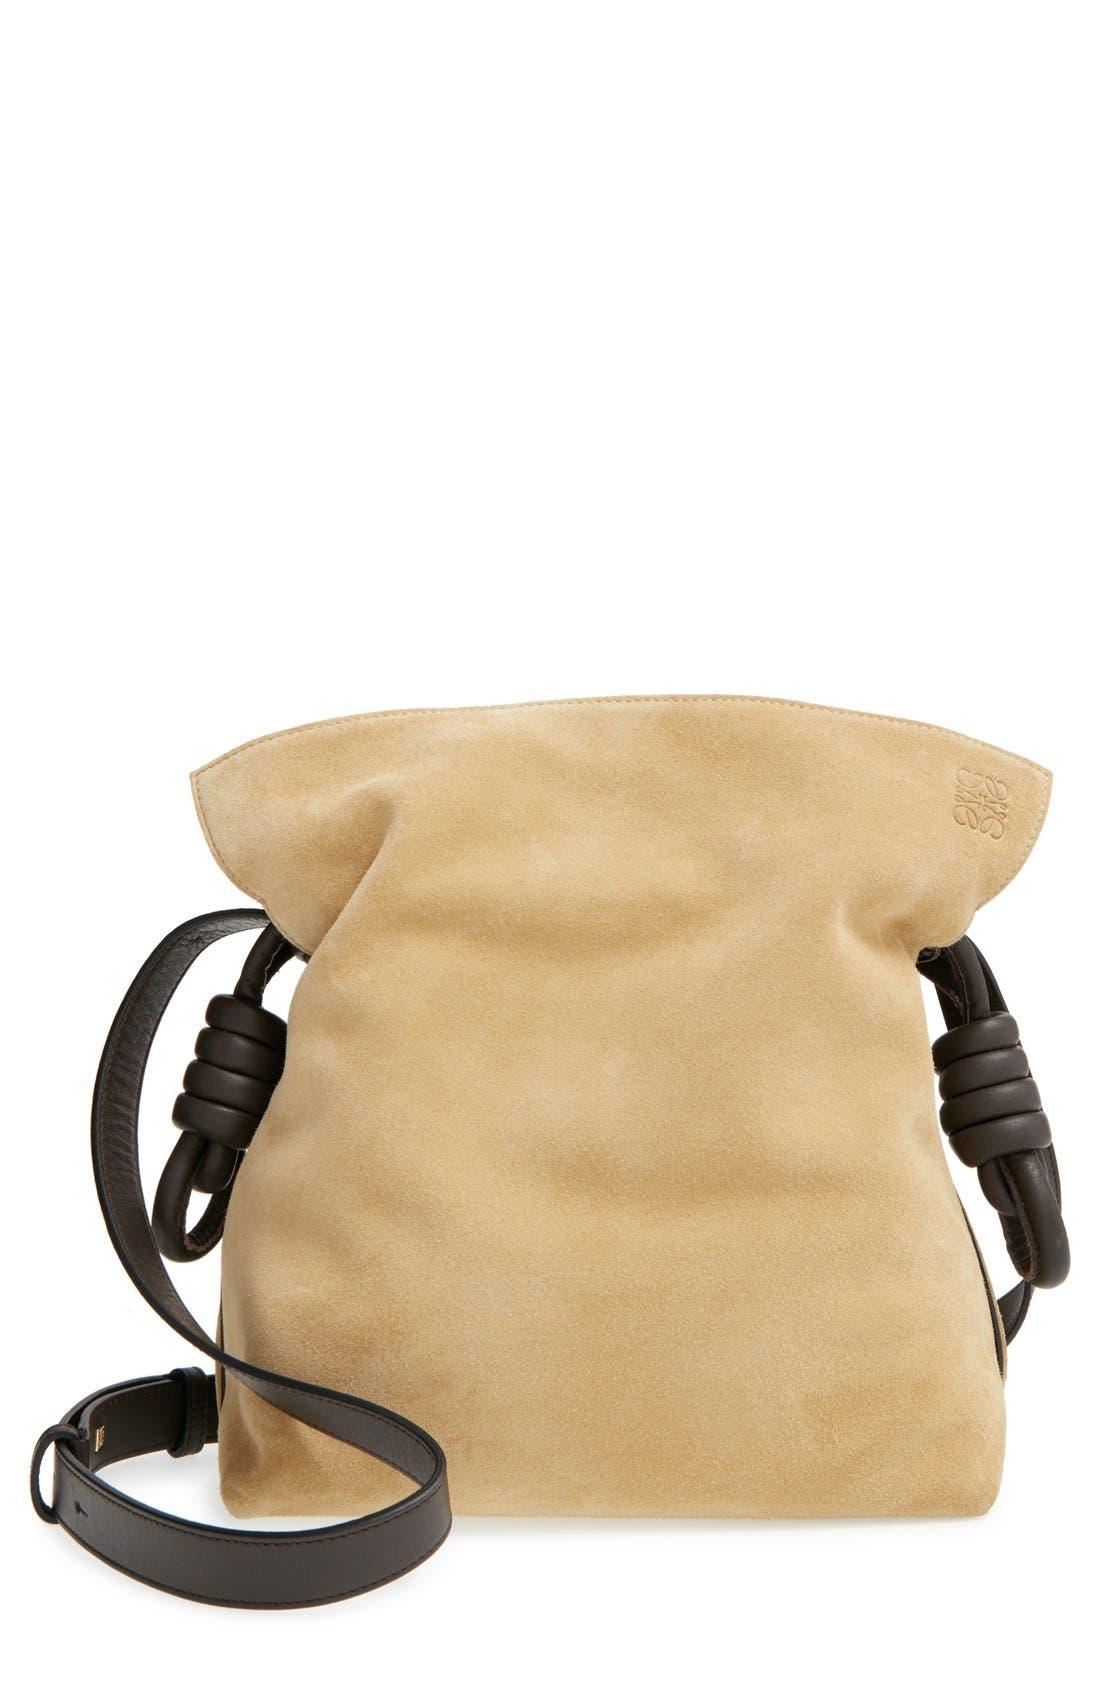 LOEWE 'Flamenco Knot' Suede & Calfskin Leather Bag, Main, color, 250